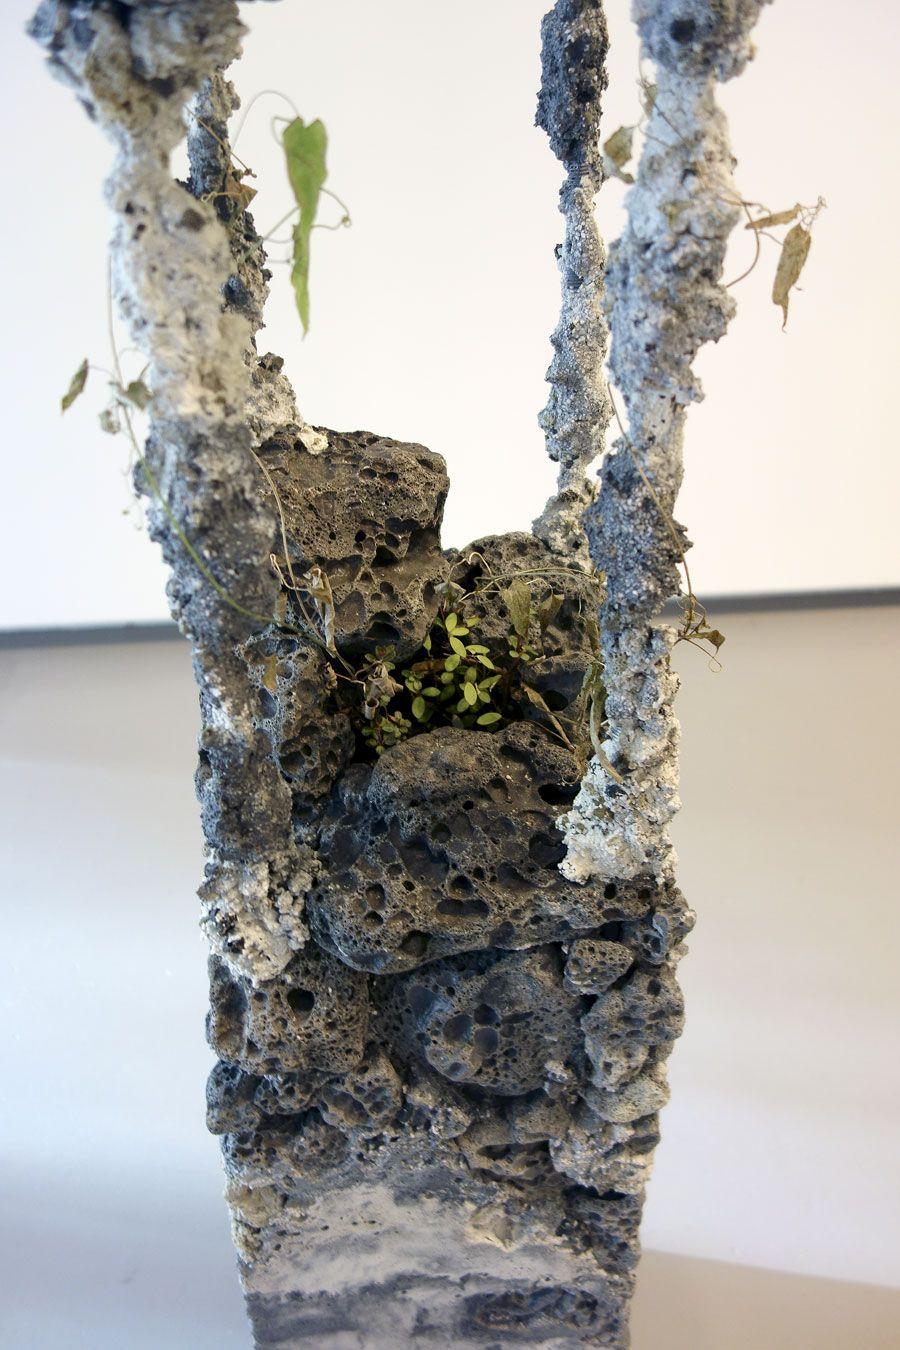 Review Concrete At The Monash University Museum Of Art Muma